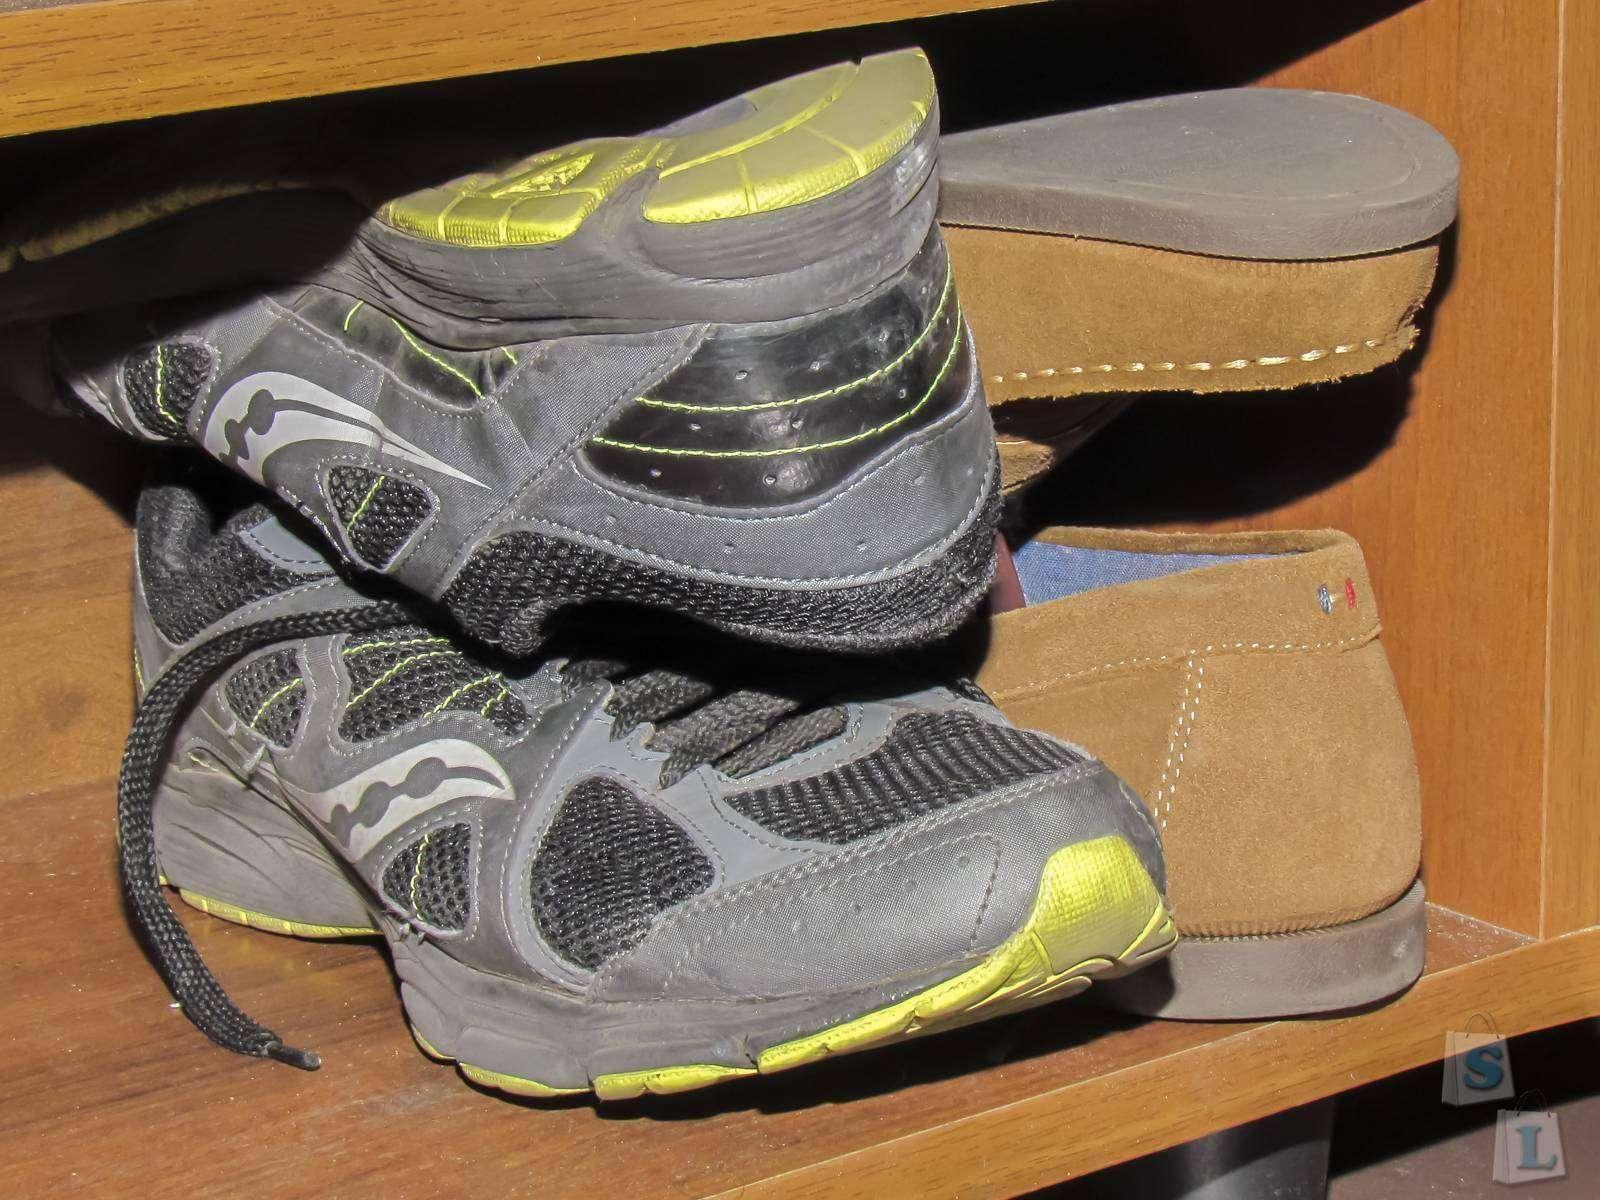 Aliexpress: Органайзер для обуви